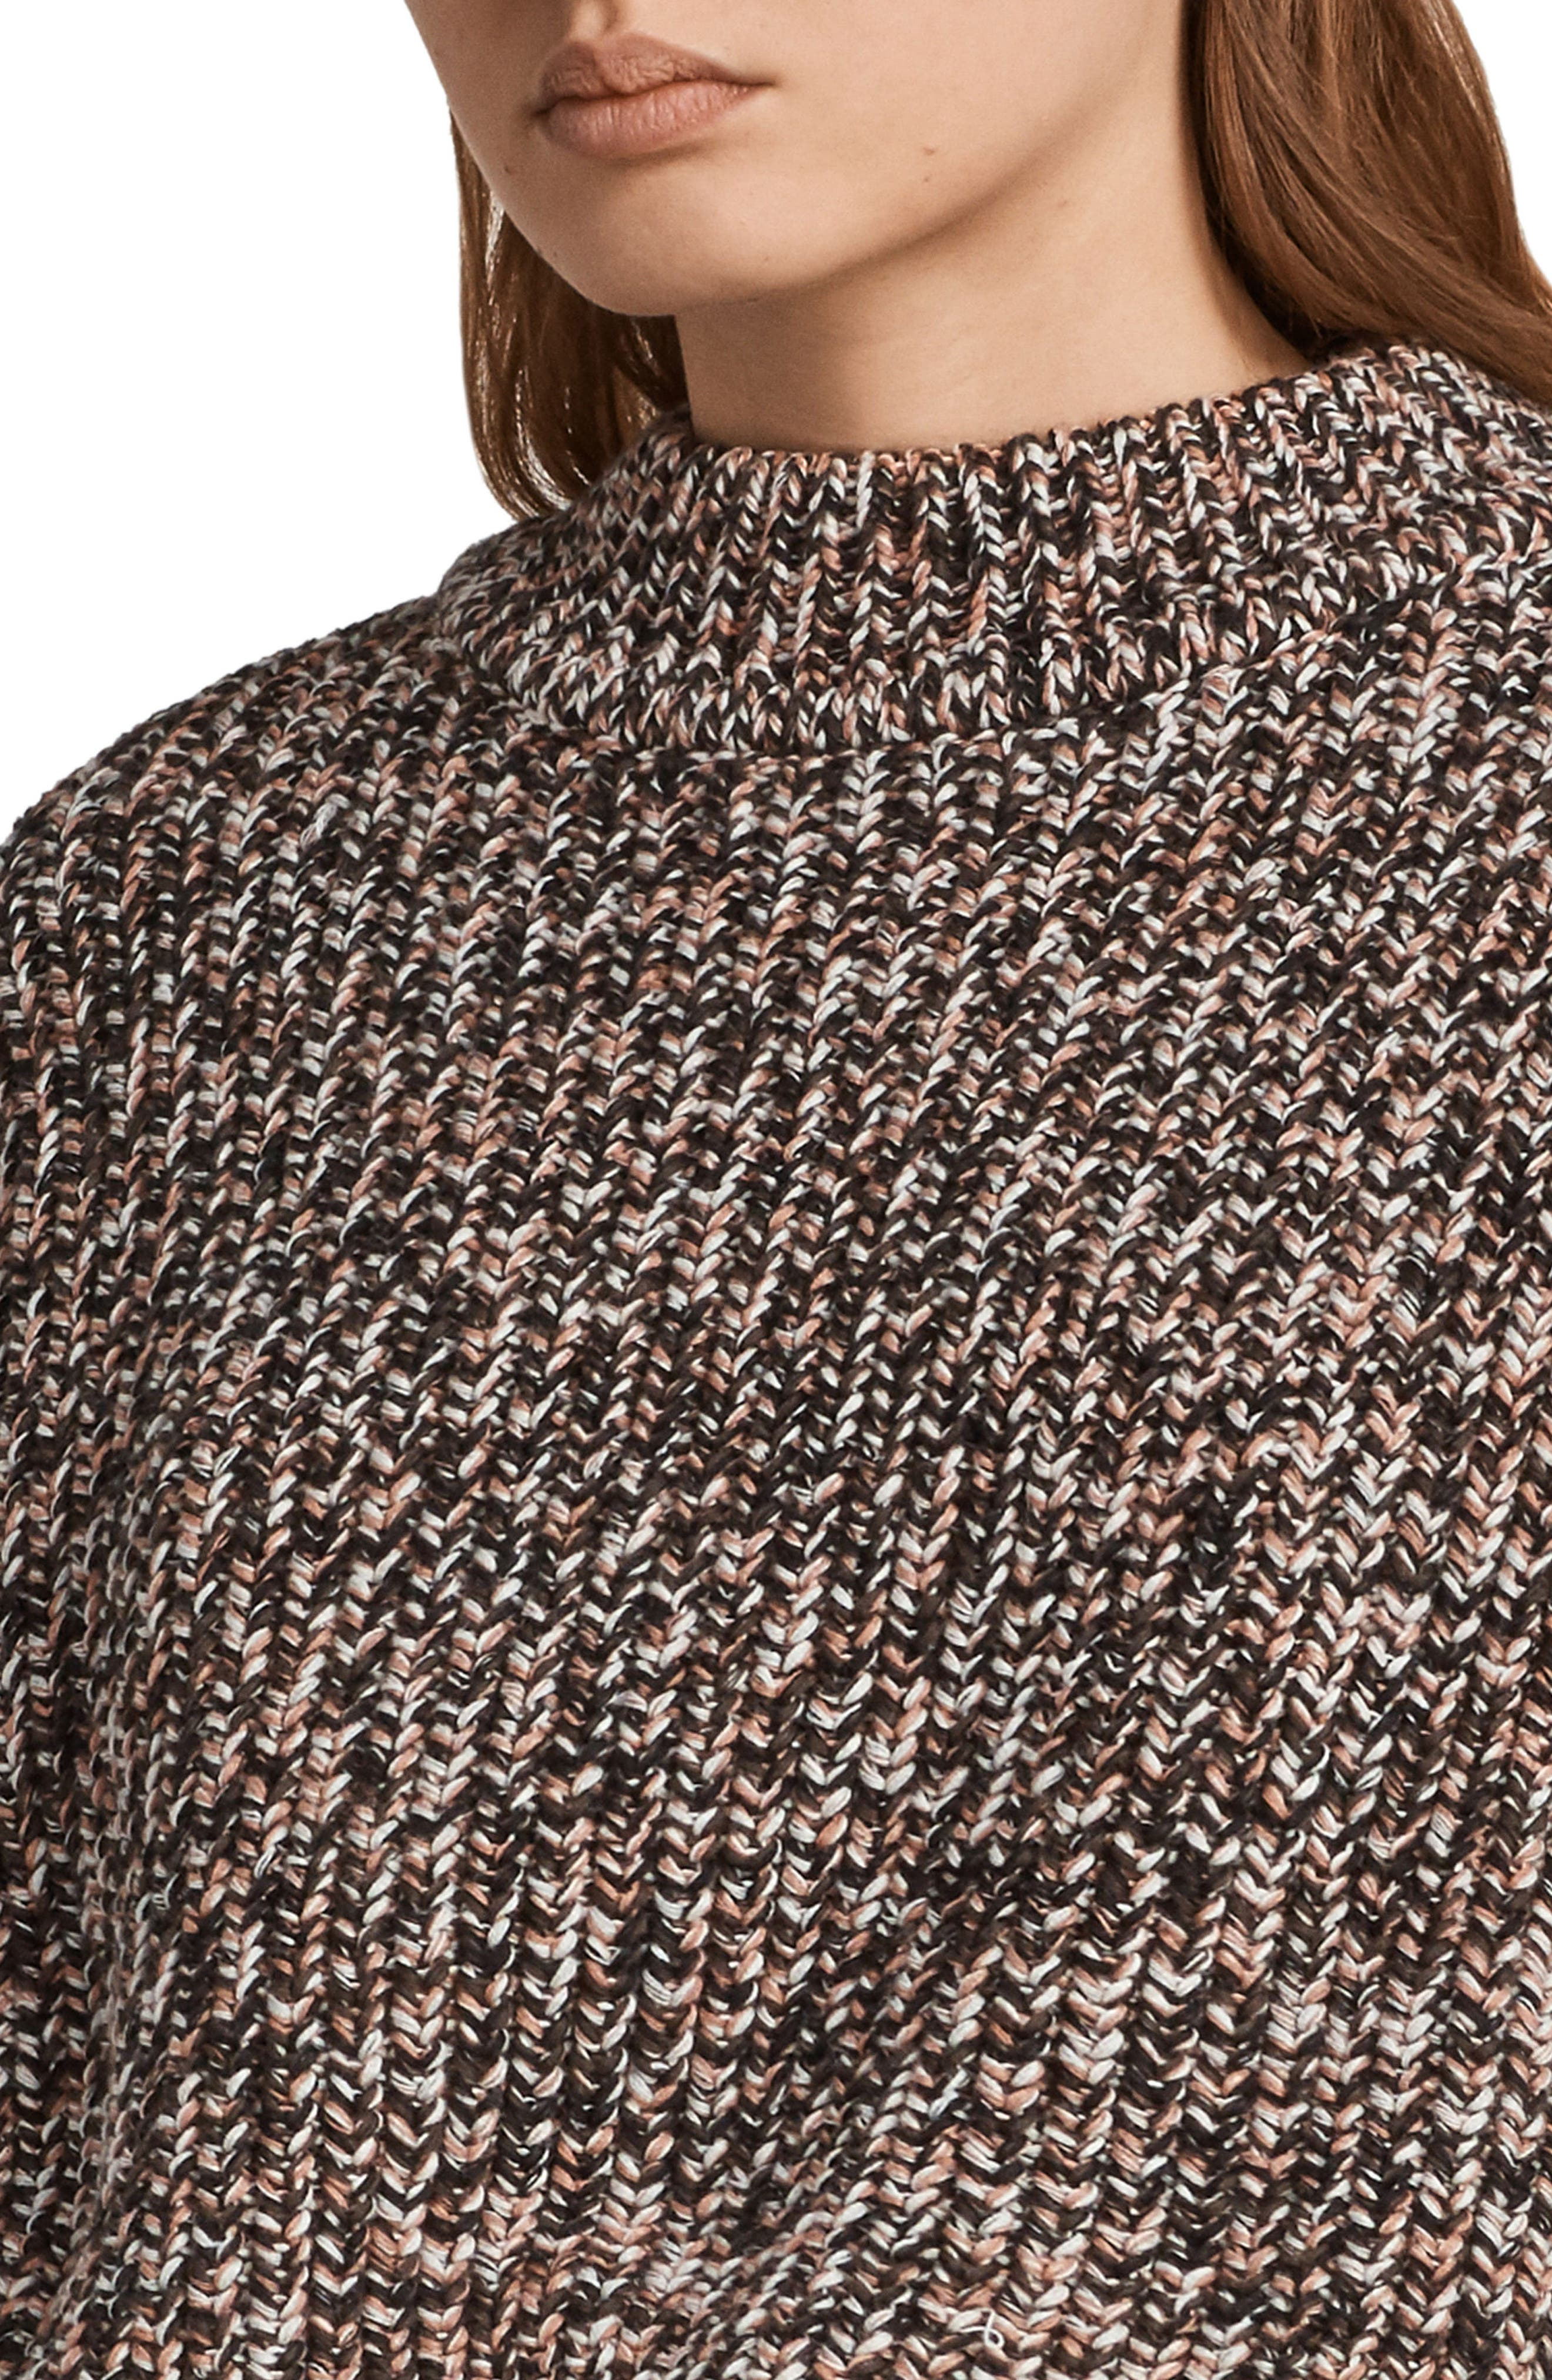 Malu Knit Sweater,                             Alternate thumbnail 4, color,                             690